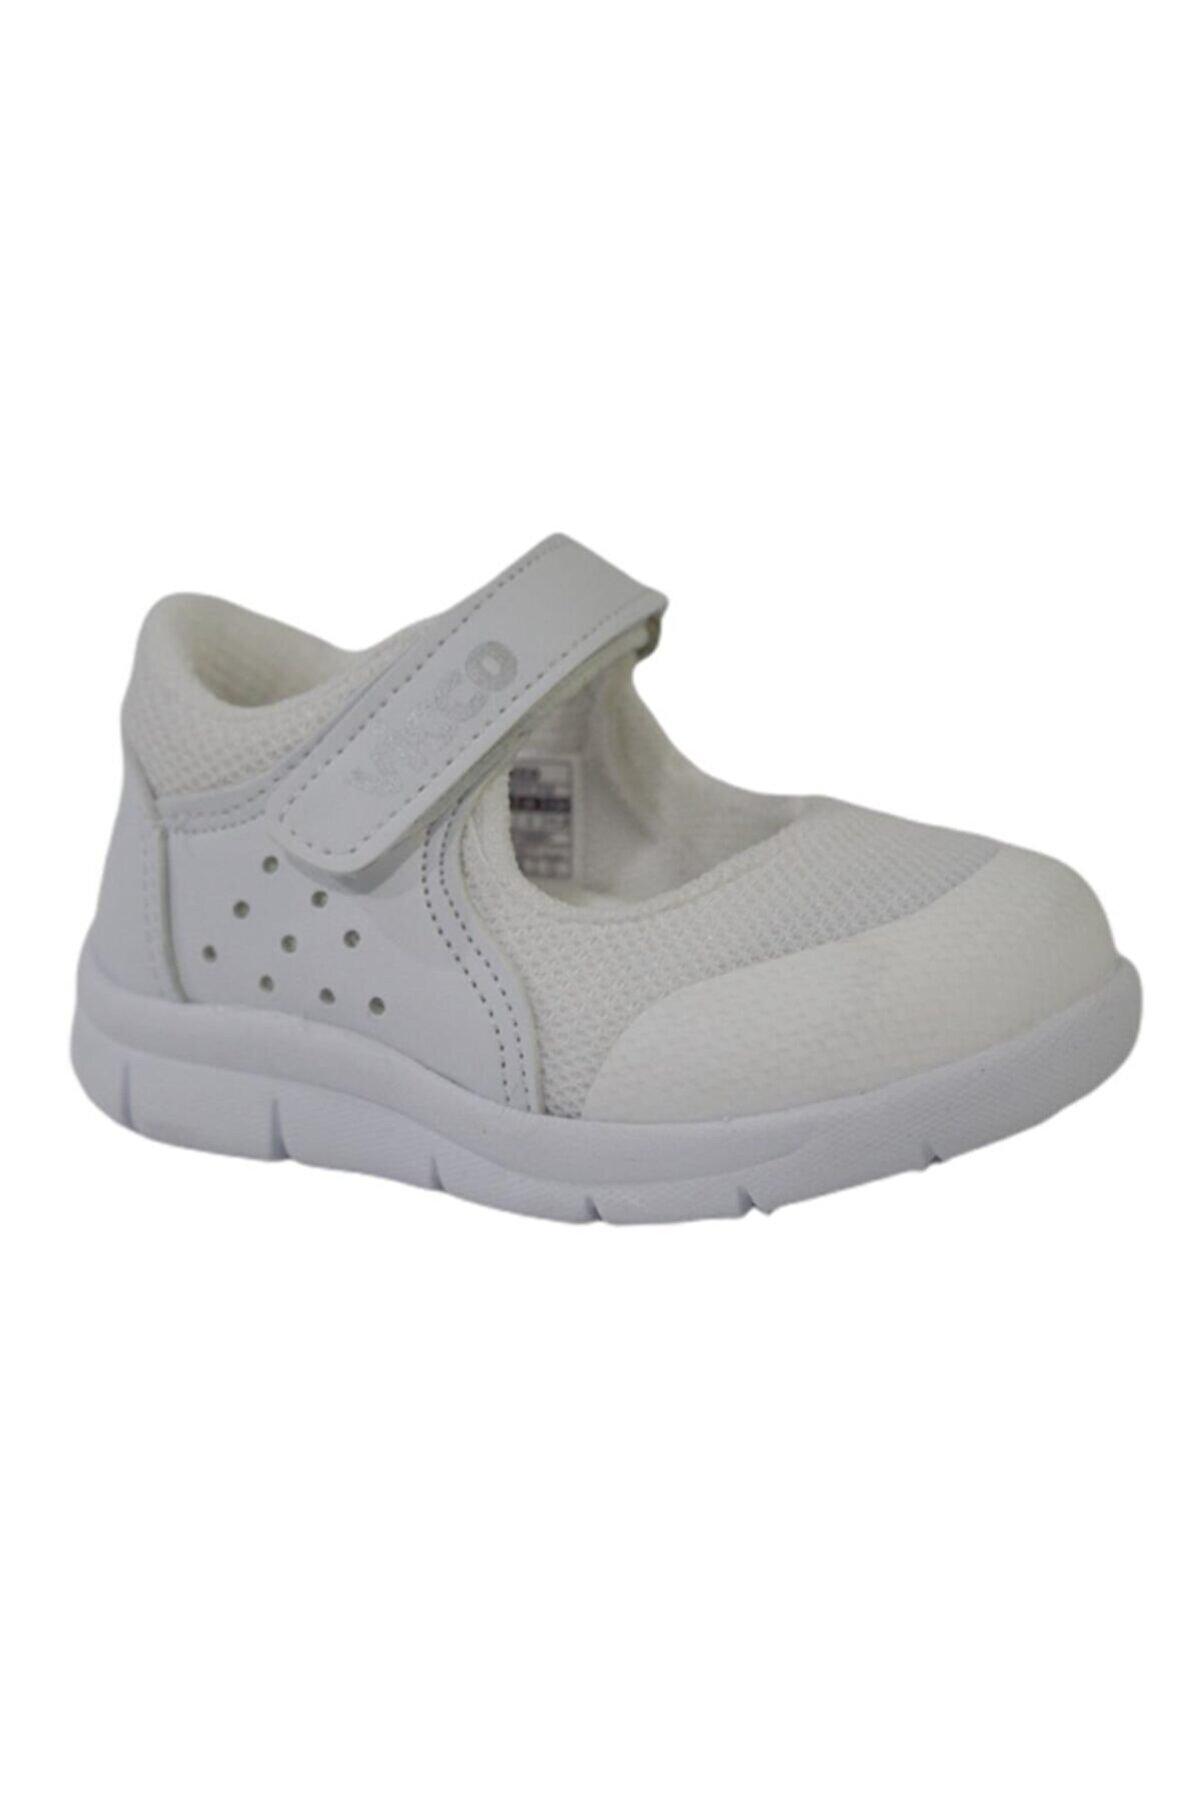 Vicco Rahat Çocuk Sandalet Ayakkabı